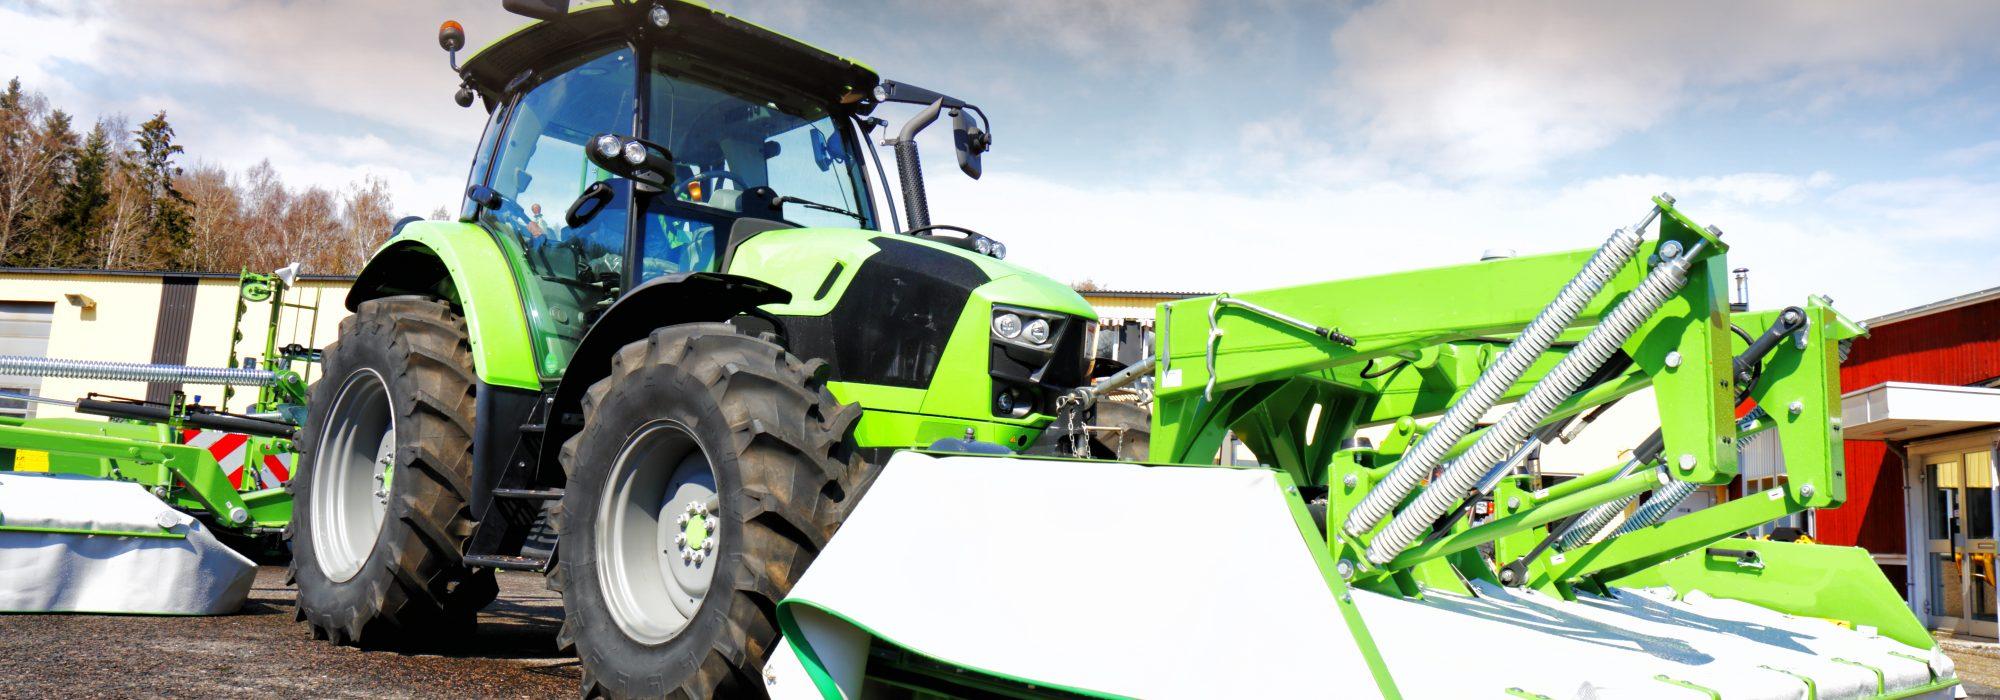 Inland Marine Farming Tractor Industry